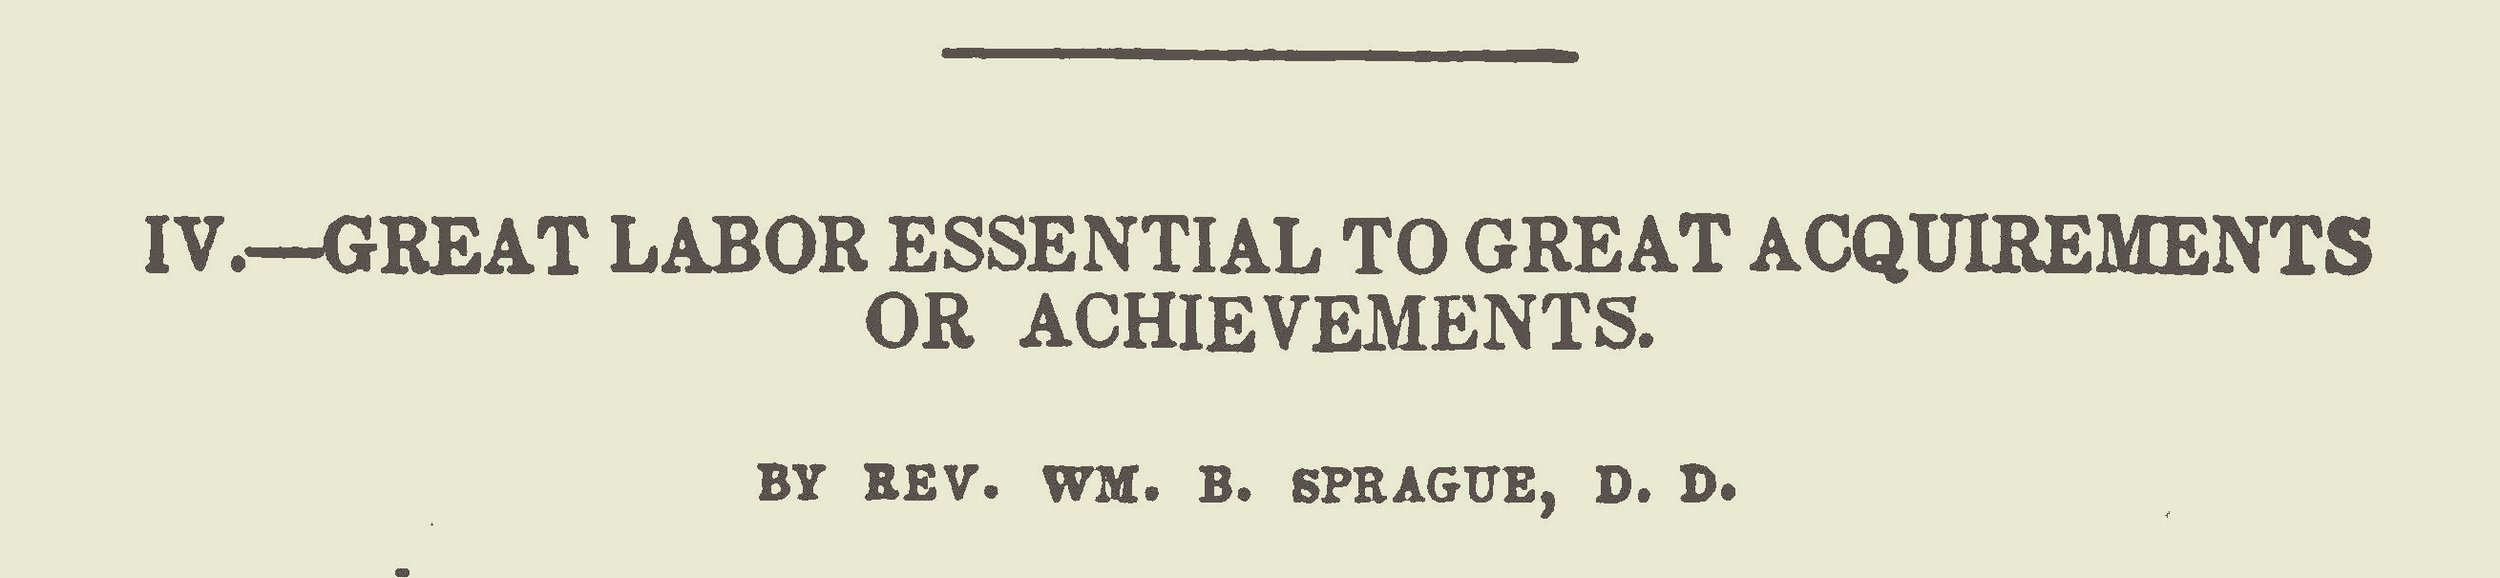 Sprague, William Buell, Great Labor Essential Title Page.jpg